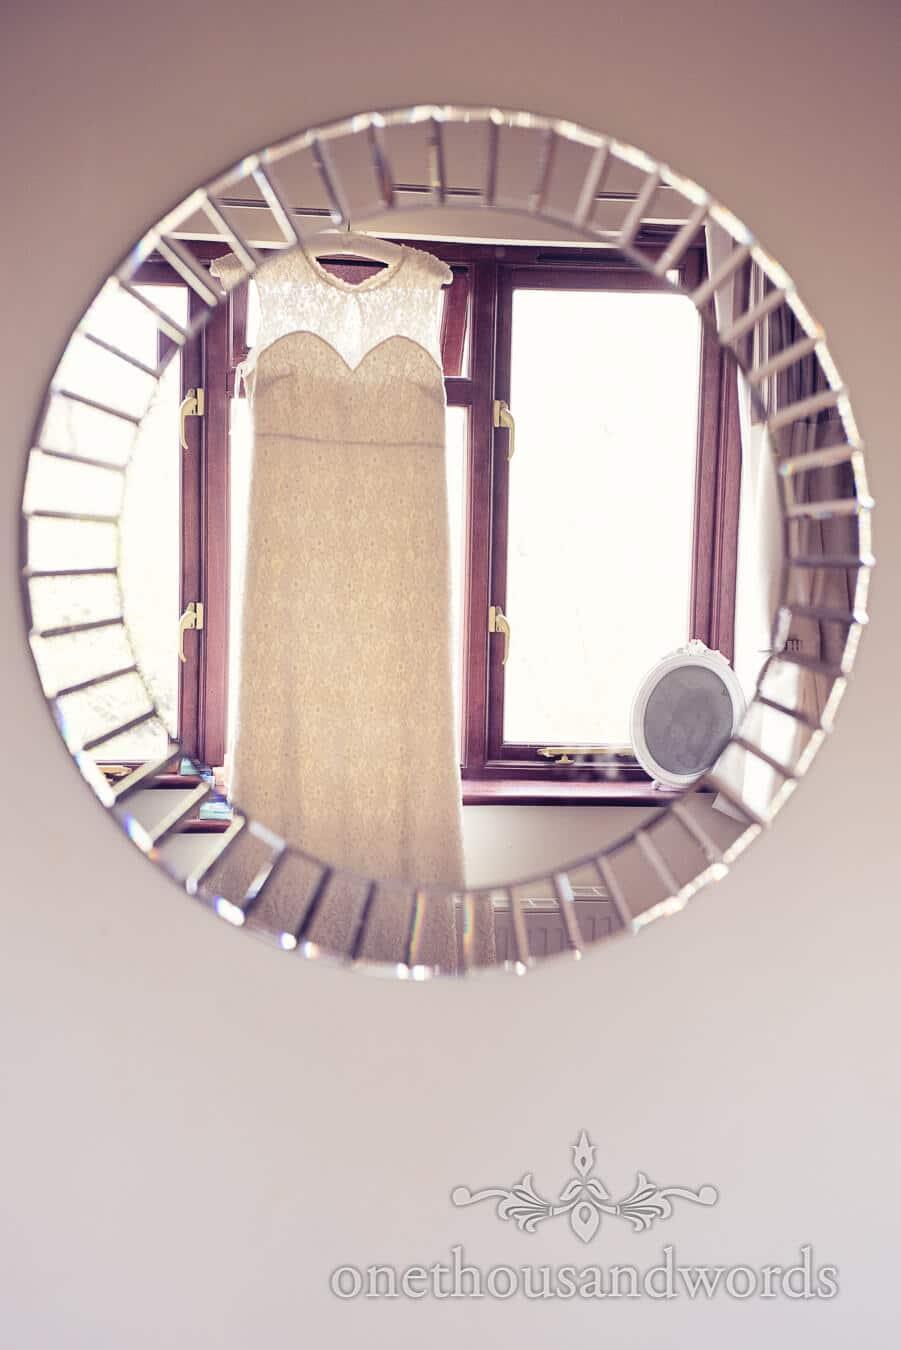 Dress in mirror on morning of Purbeck Golf Club Wedding